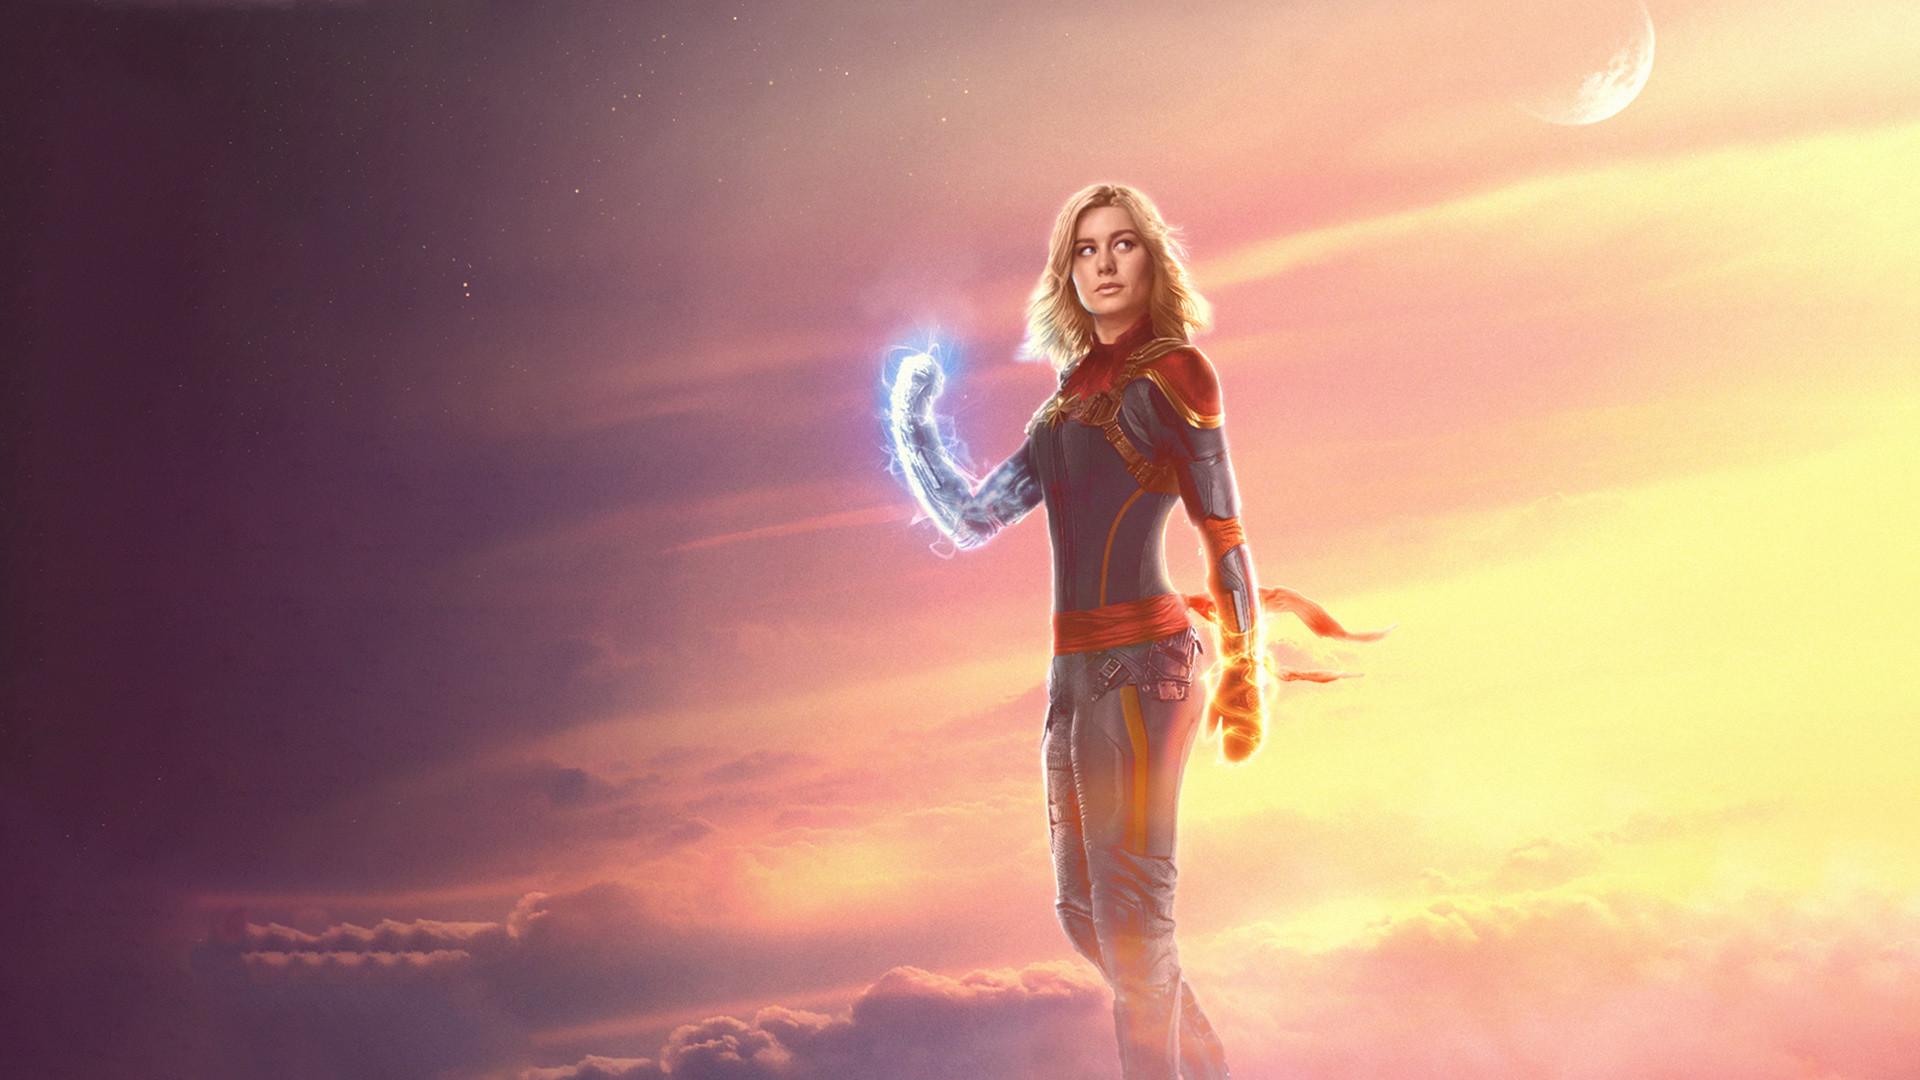 Res: 1920x1080, Brie Larson as Captain Marvel